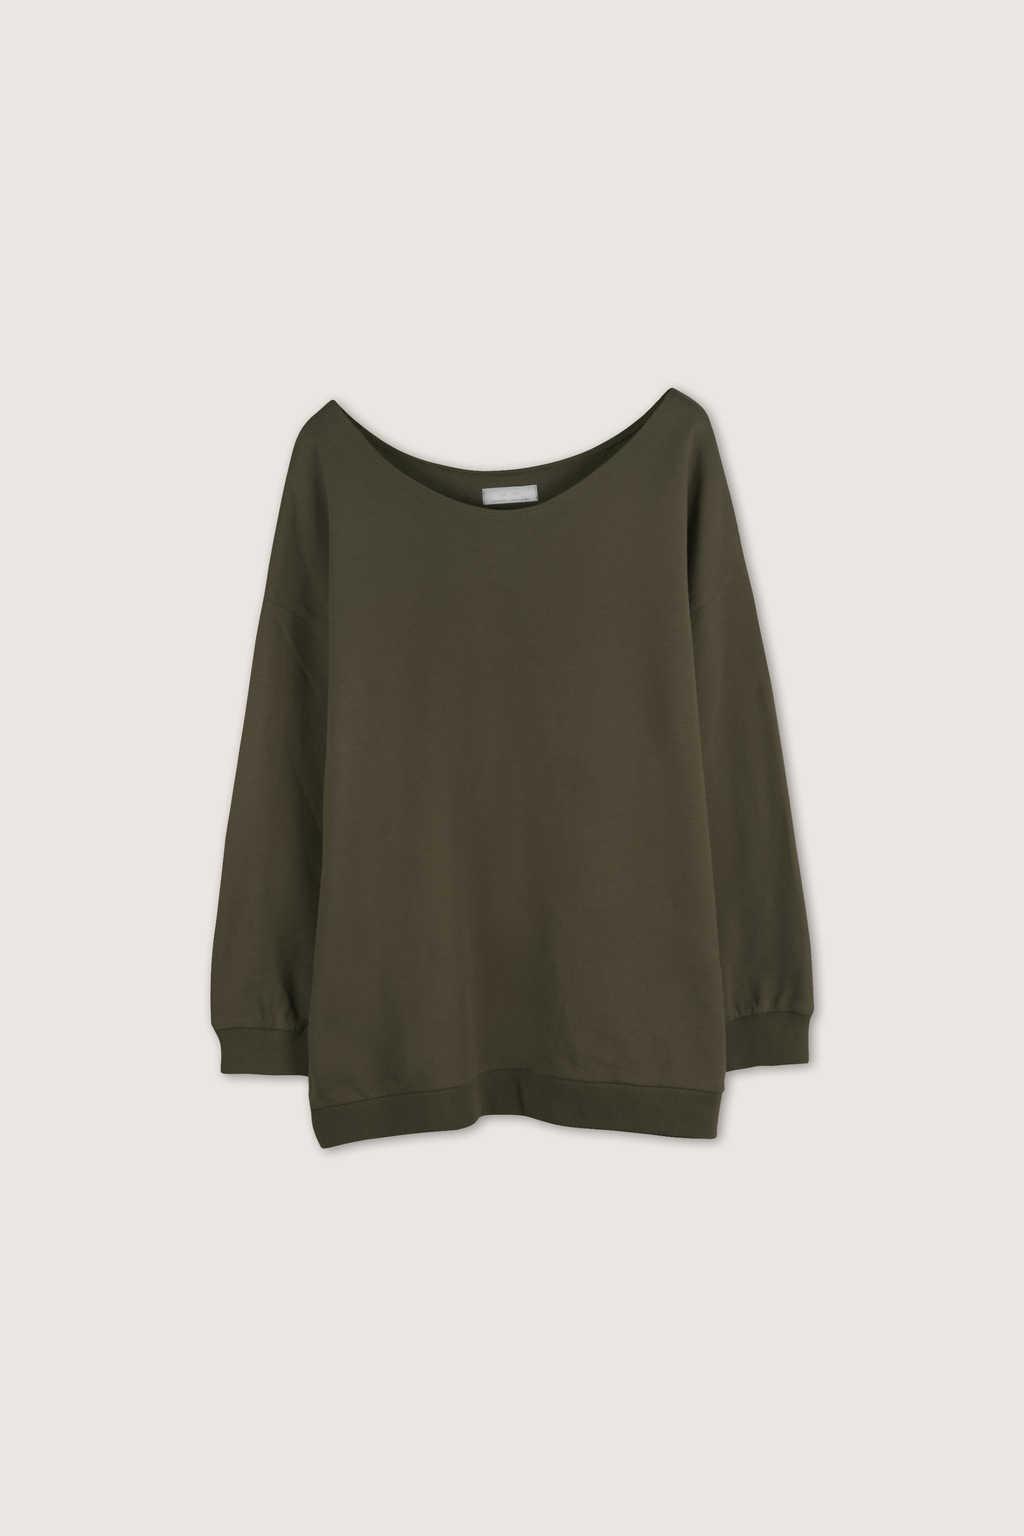 Sweatshirt 1950 Olive 9